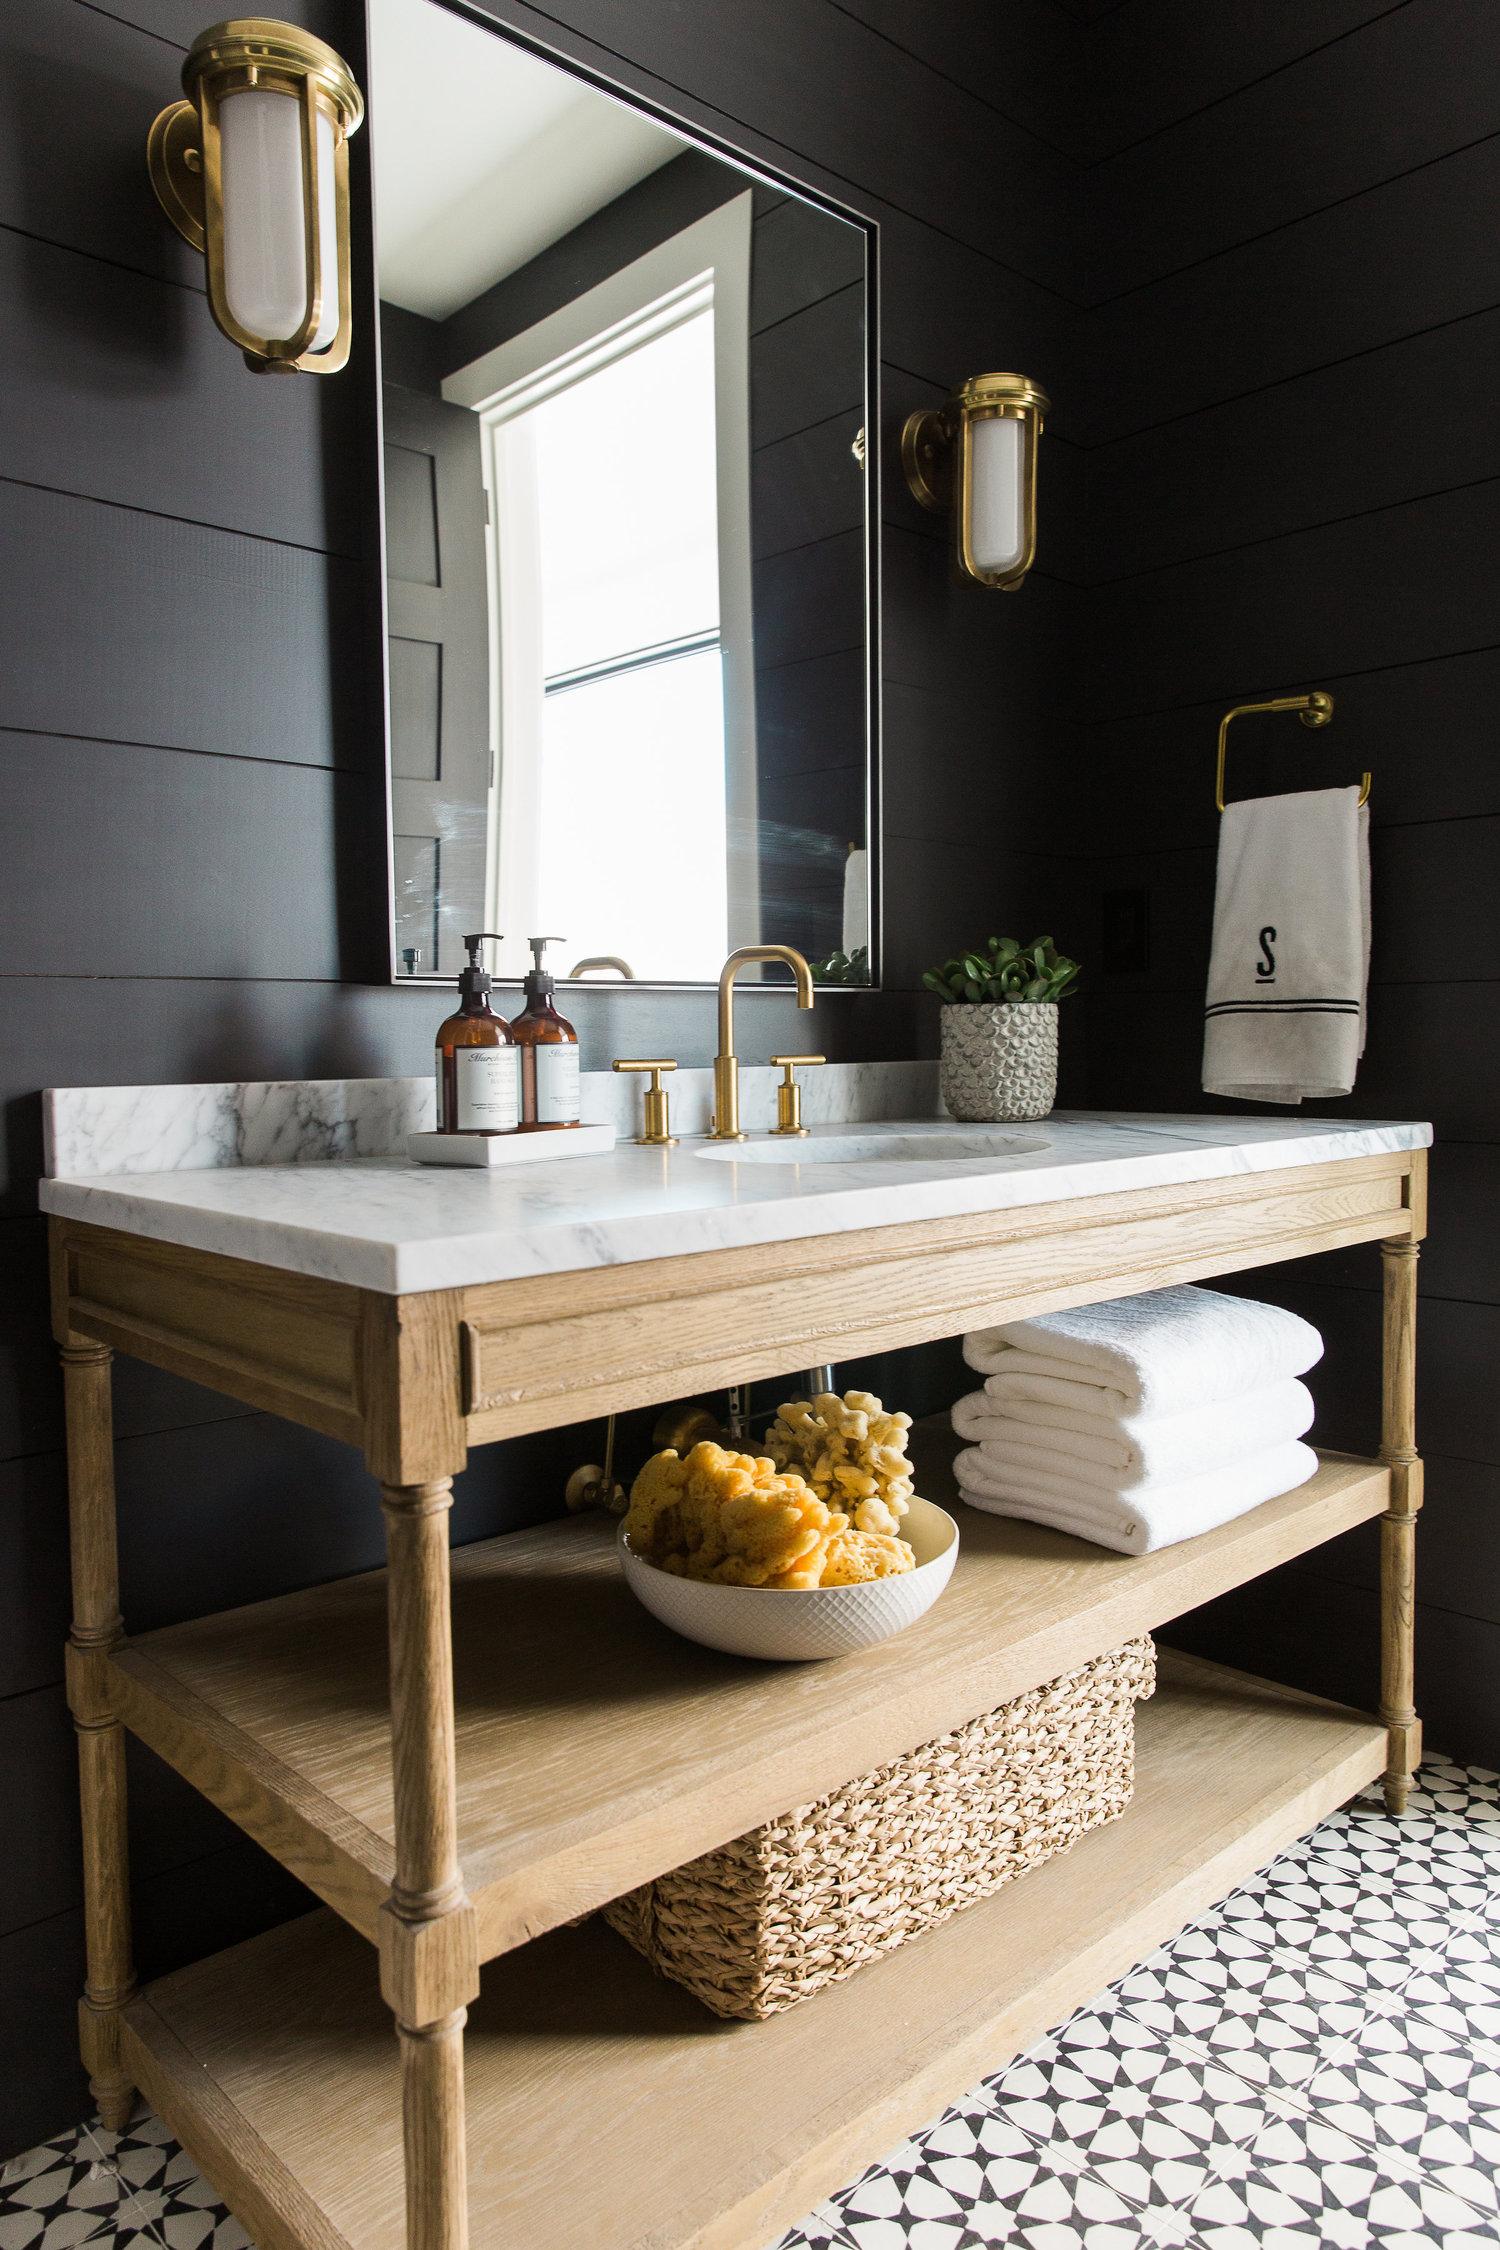 Wooden vanity beneath large mirror